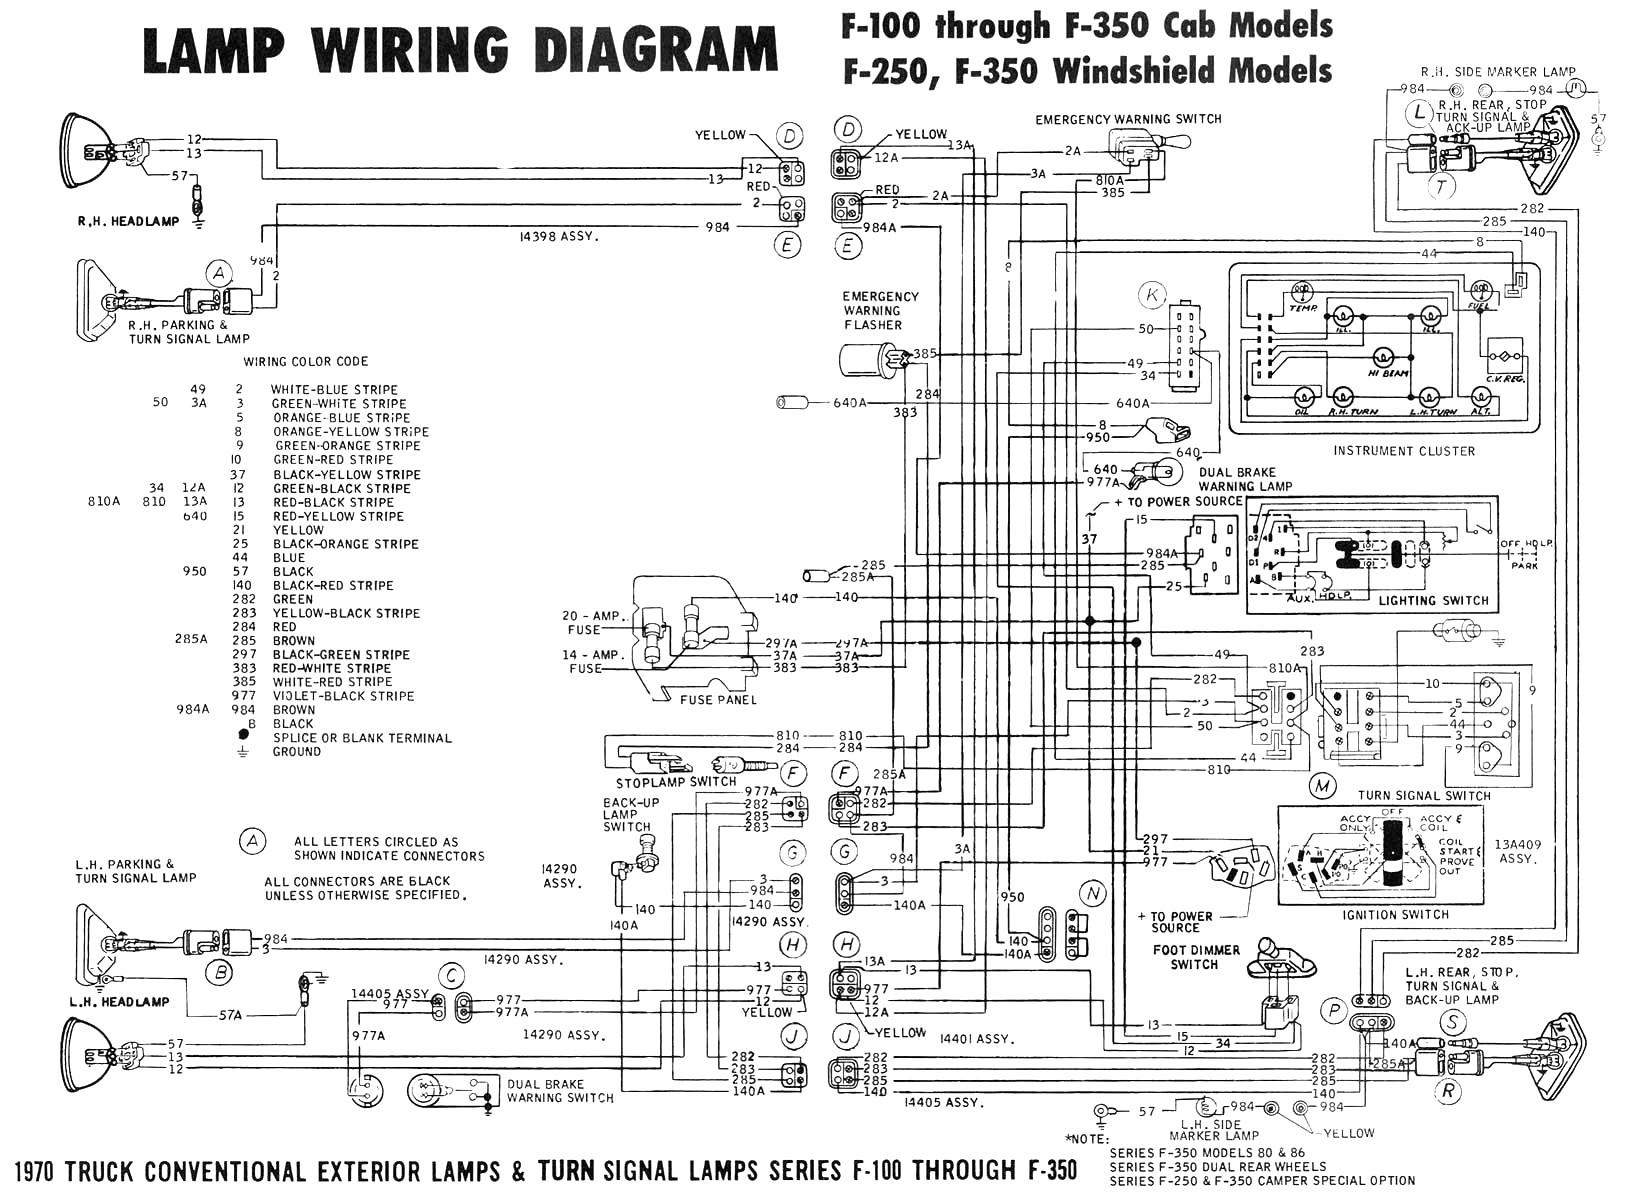 1996 f250 wiring harness book diagram schema 1996 ford f250 radio wiring harness diagram 1996 ford